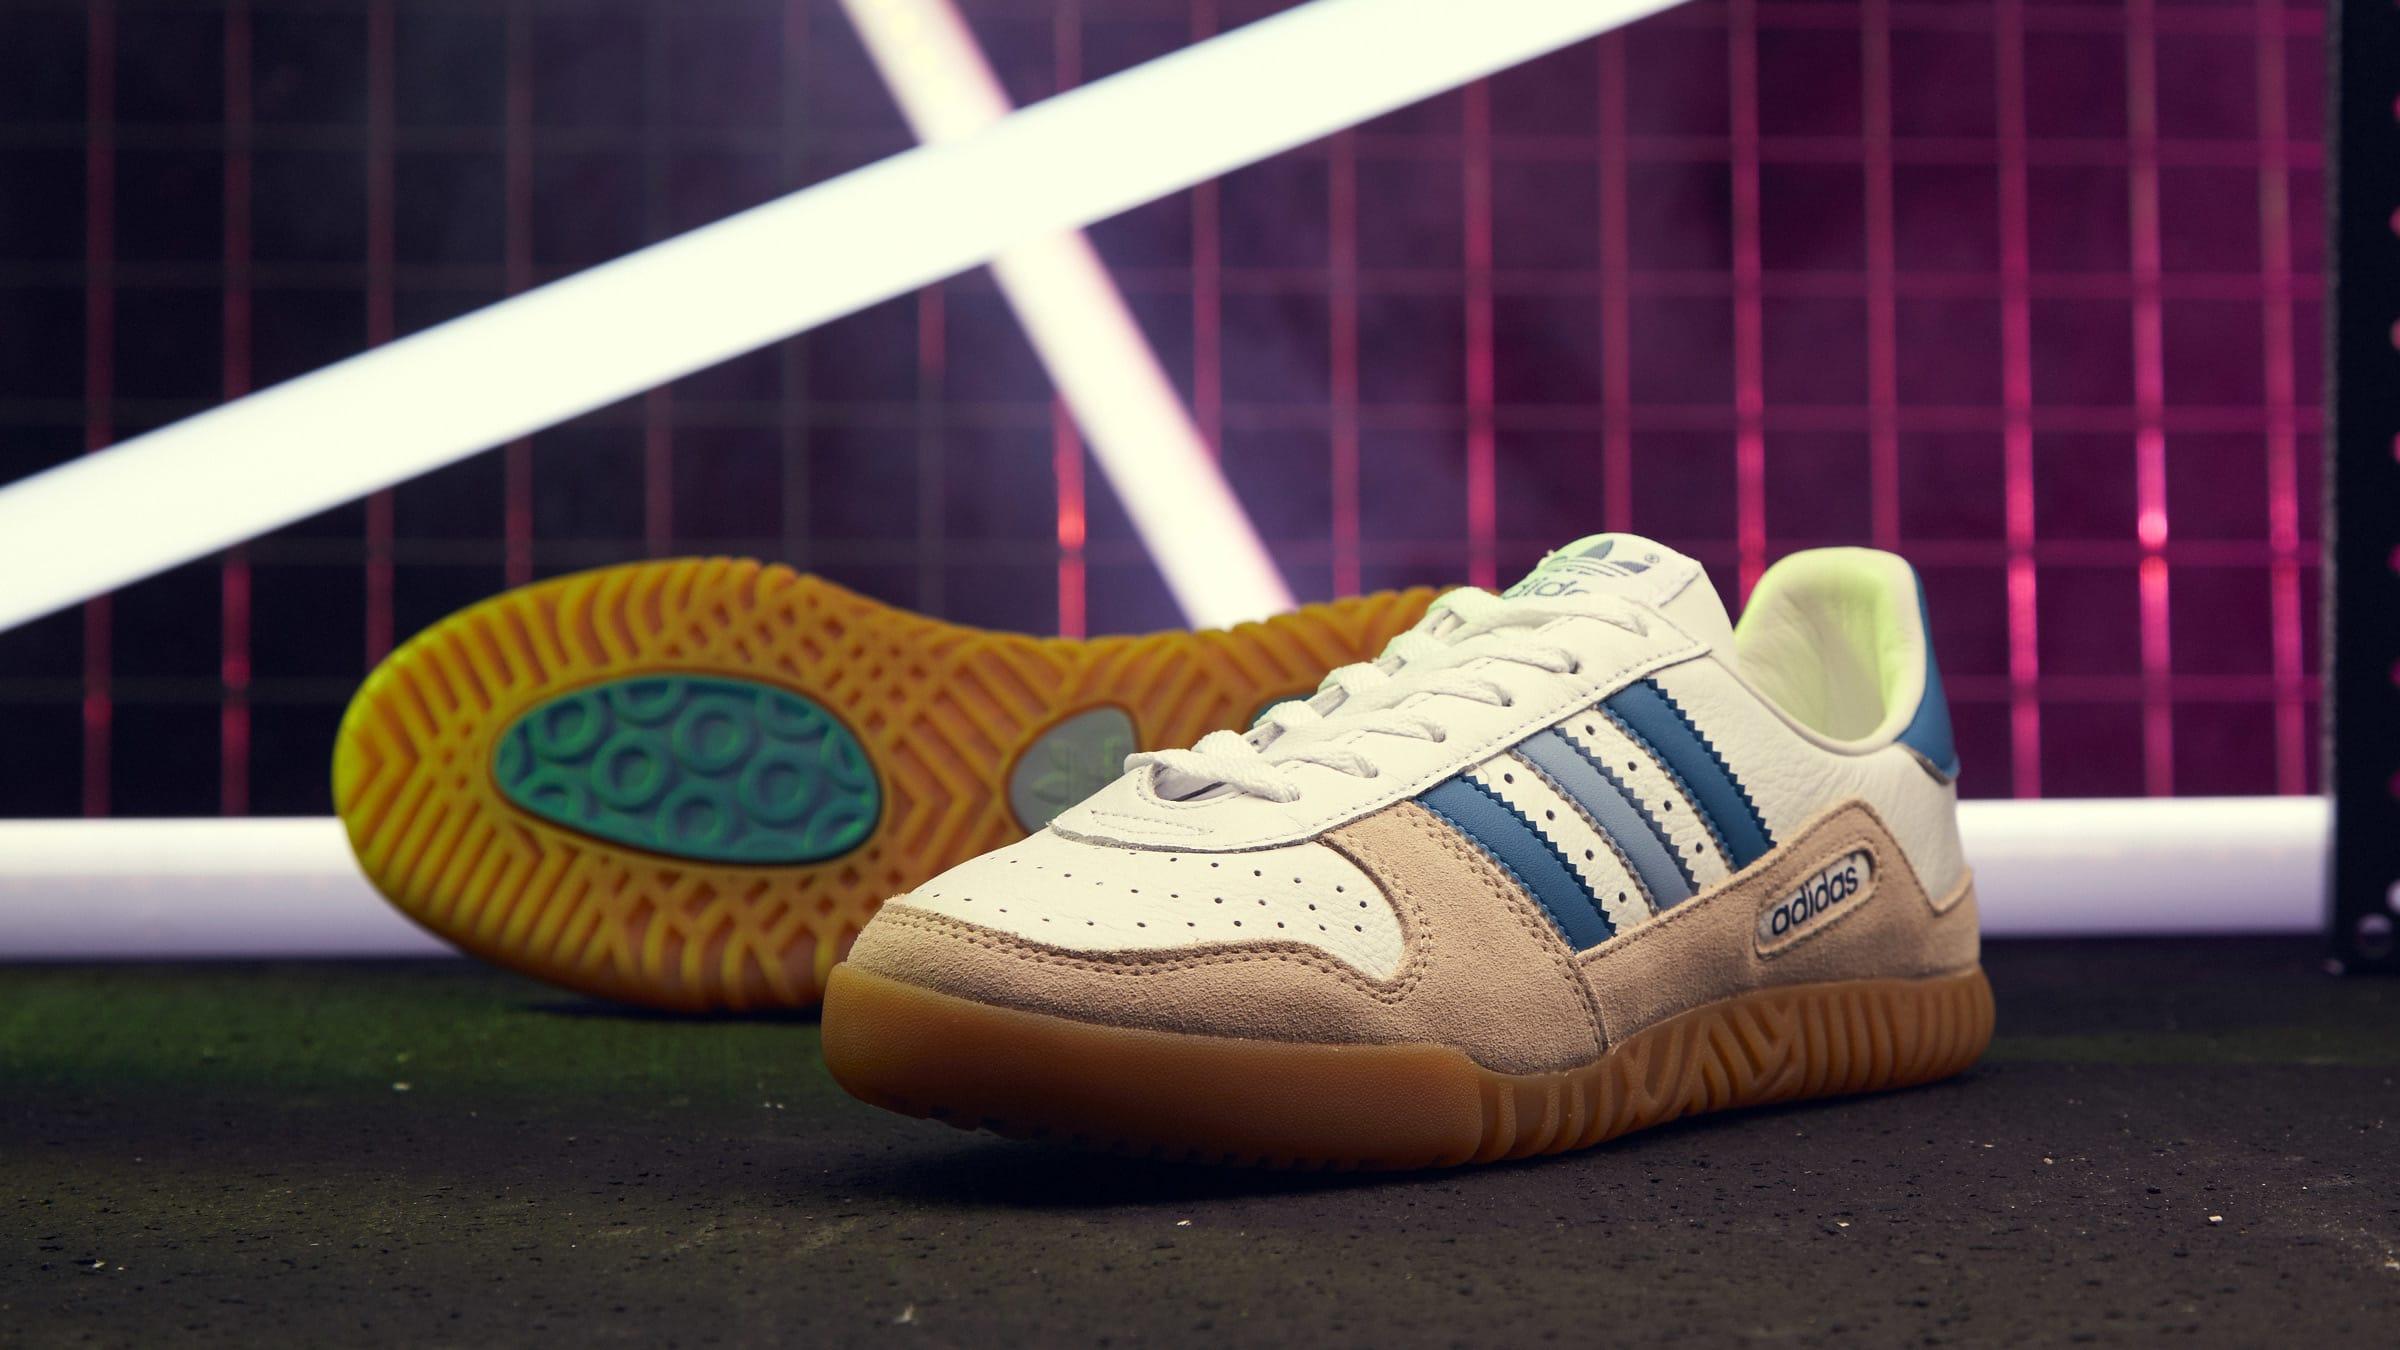 adidas SPZL AW18 Footwear - Register